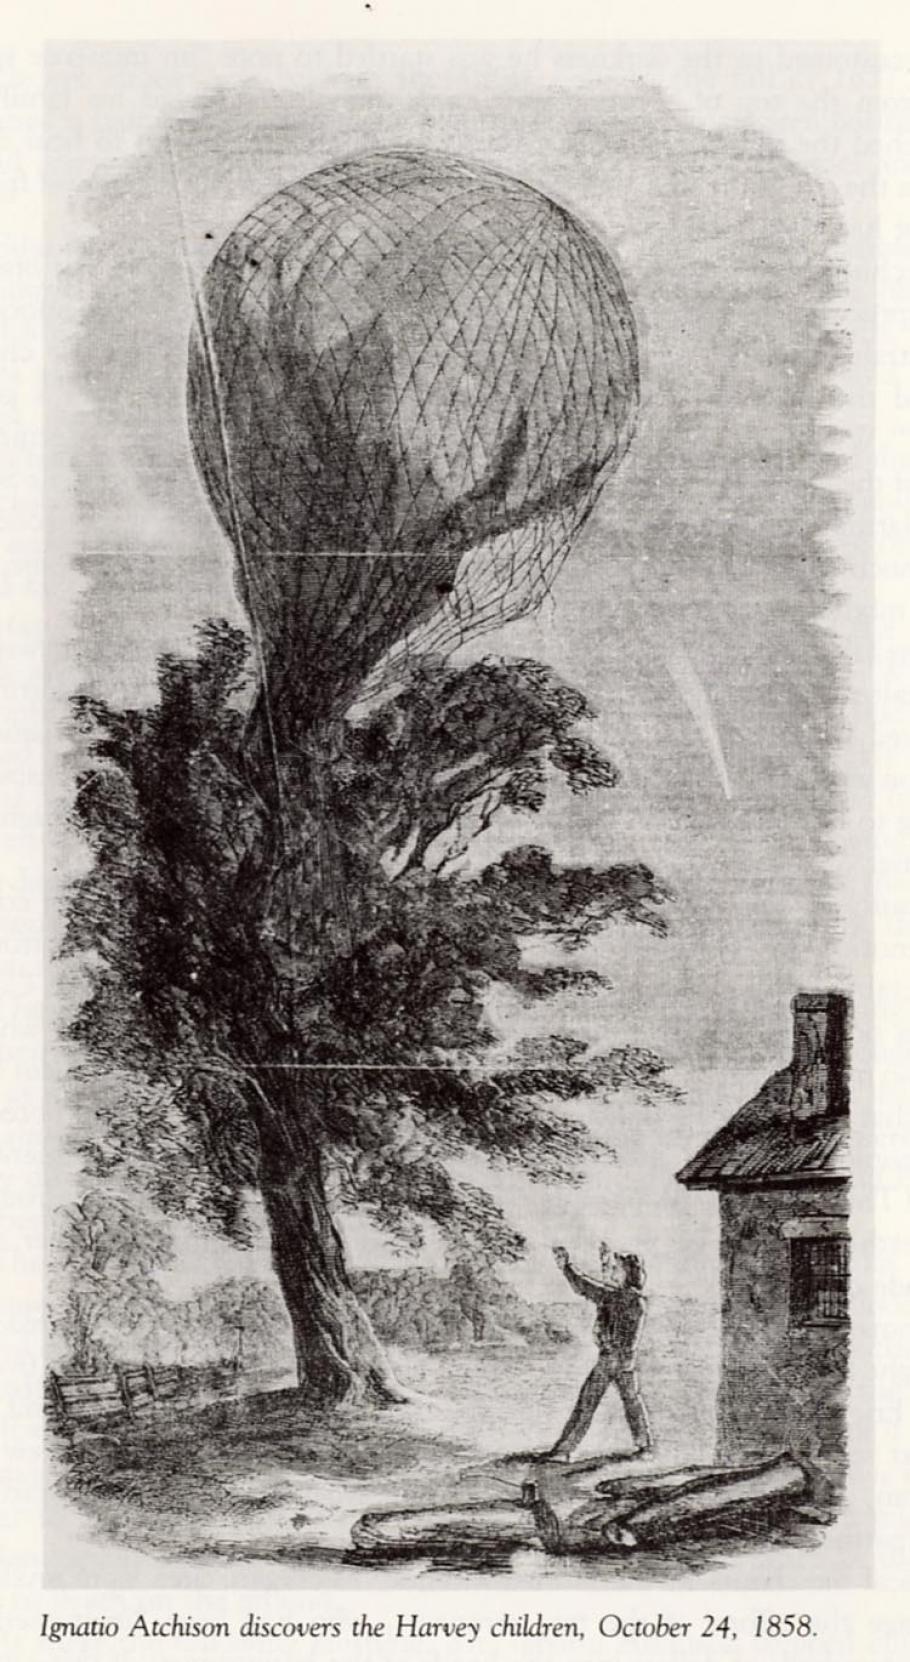 Ignatio Atchison Discovers Harvey Children in Runaway Balloon, Oct 24, 1858